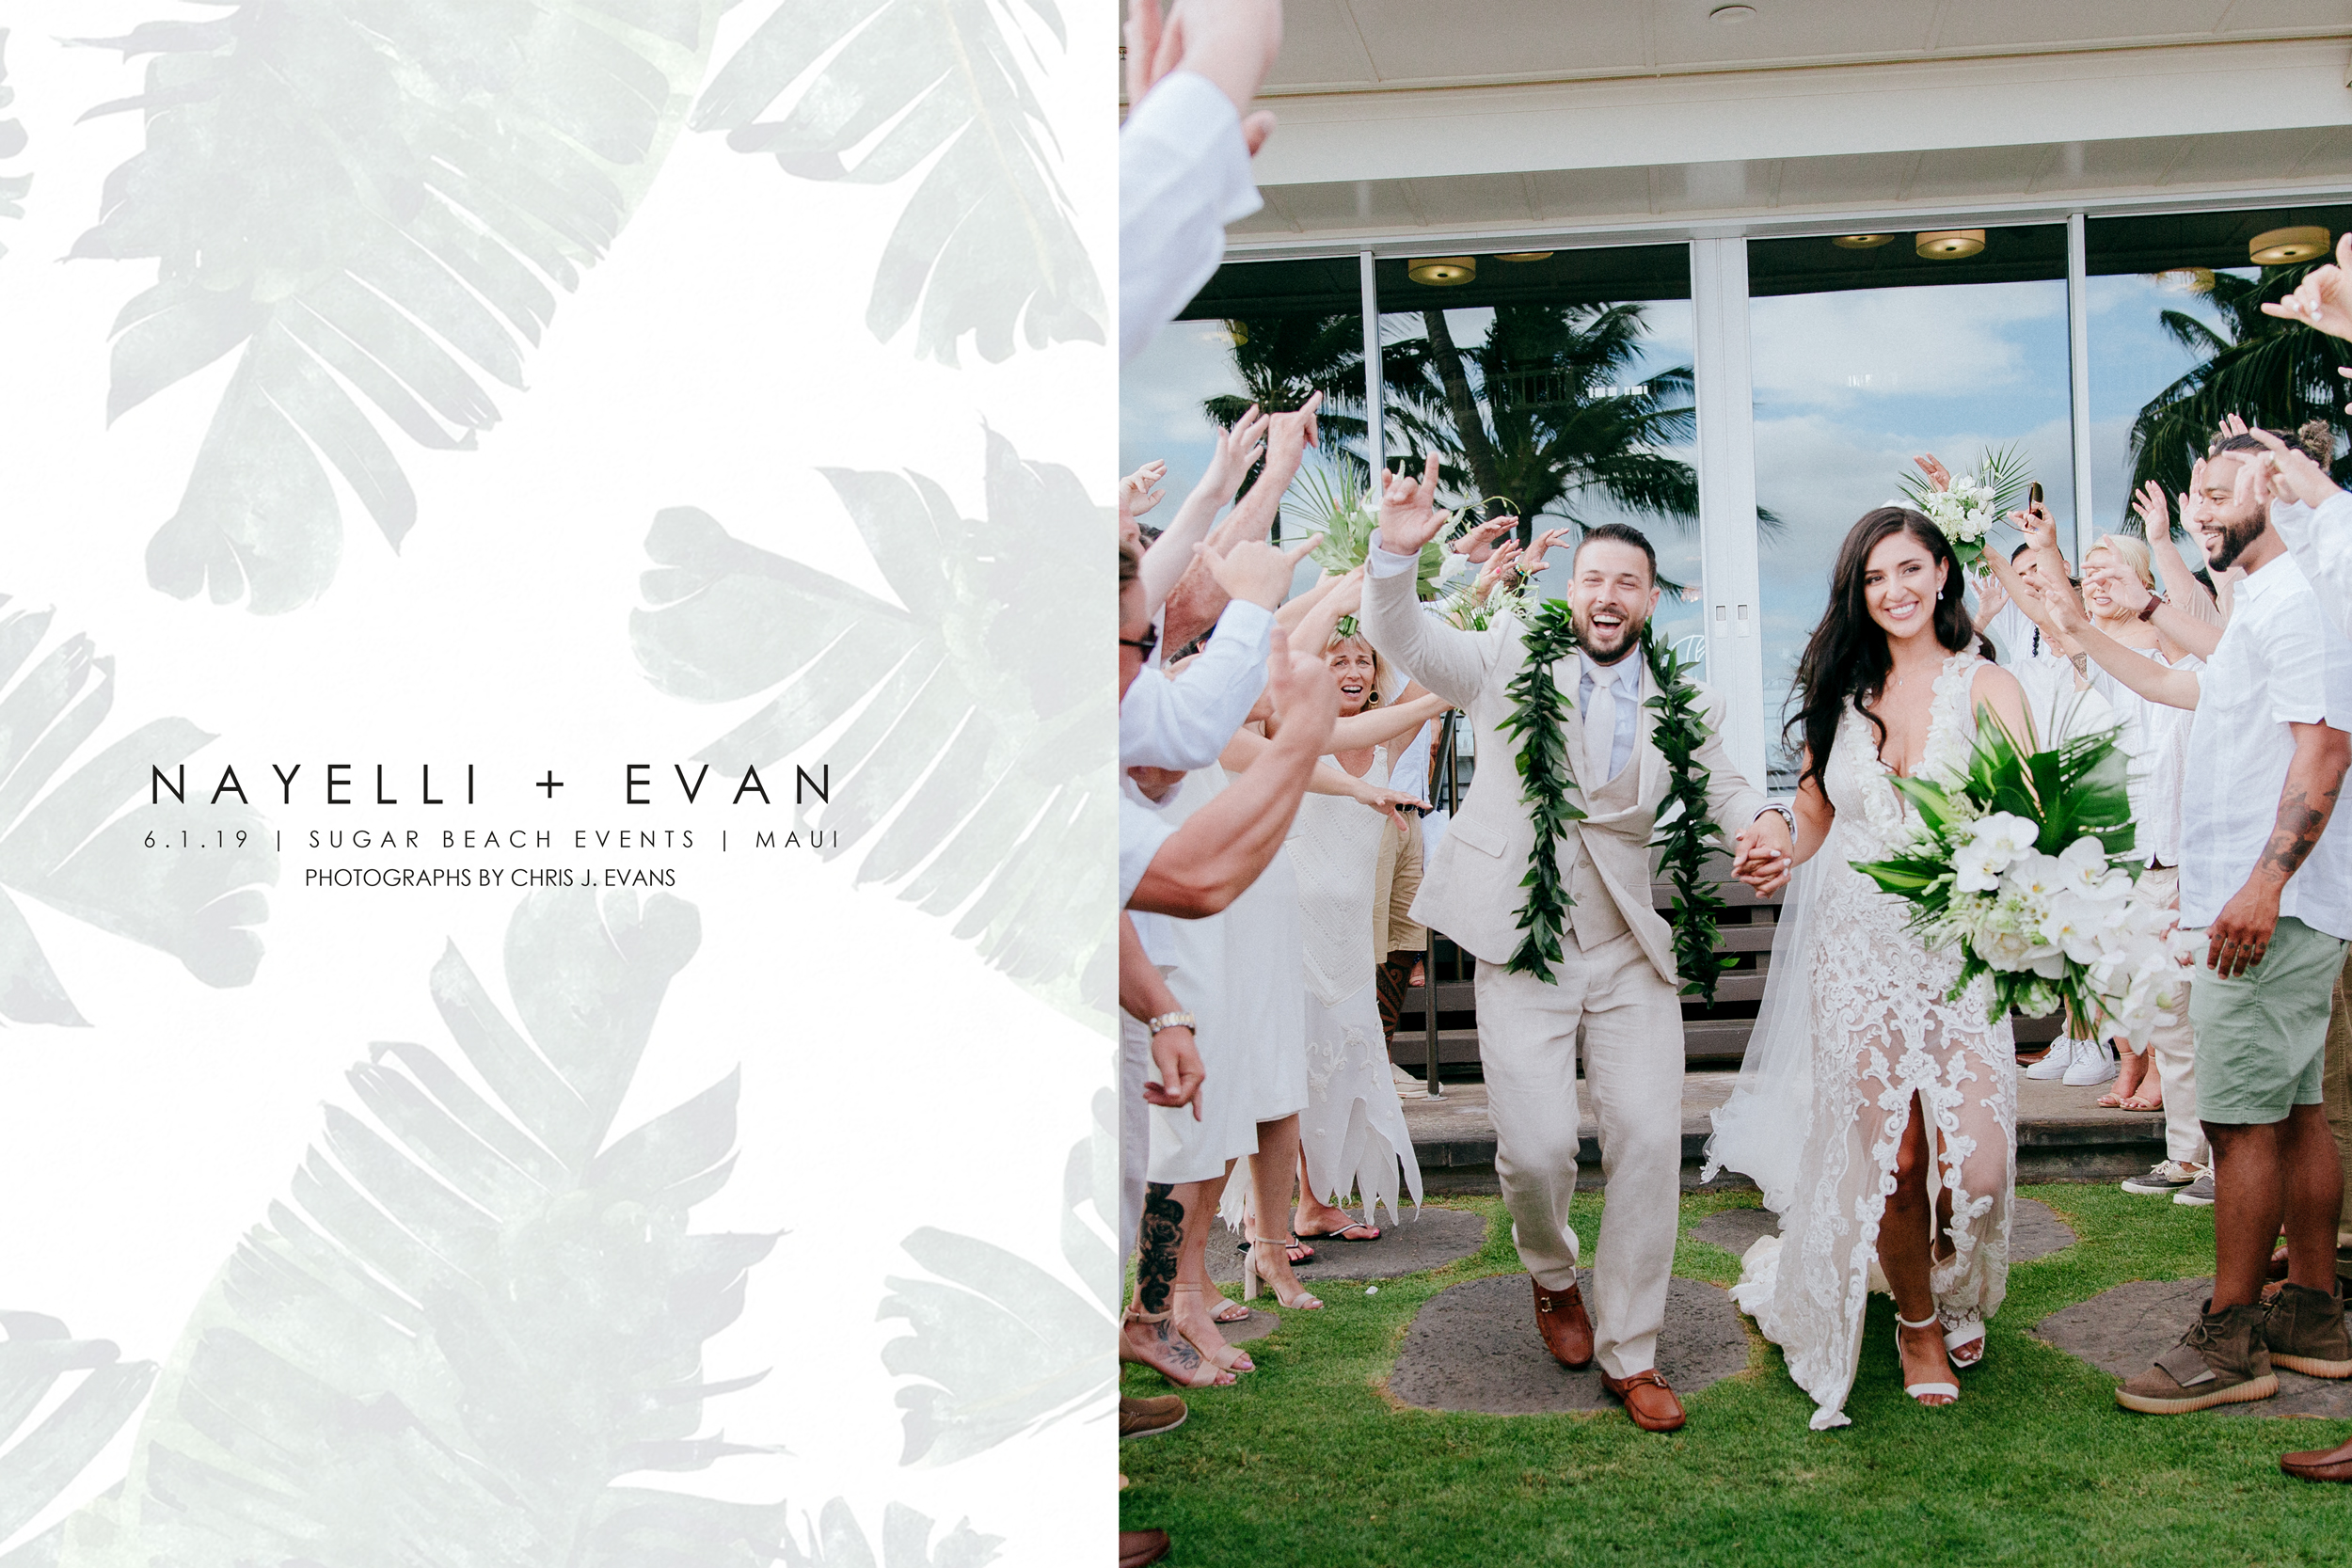 d7ceff55f3 6.19.19 Tropical Hawaii meets soft glam | destination wedding photographer  chris j. evans